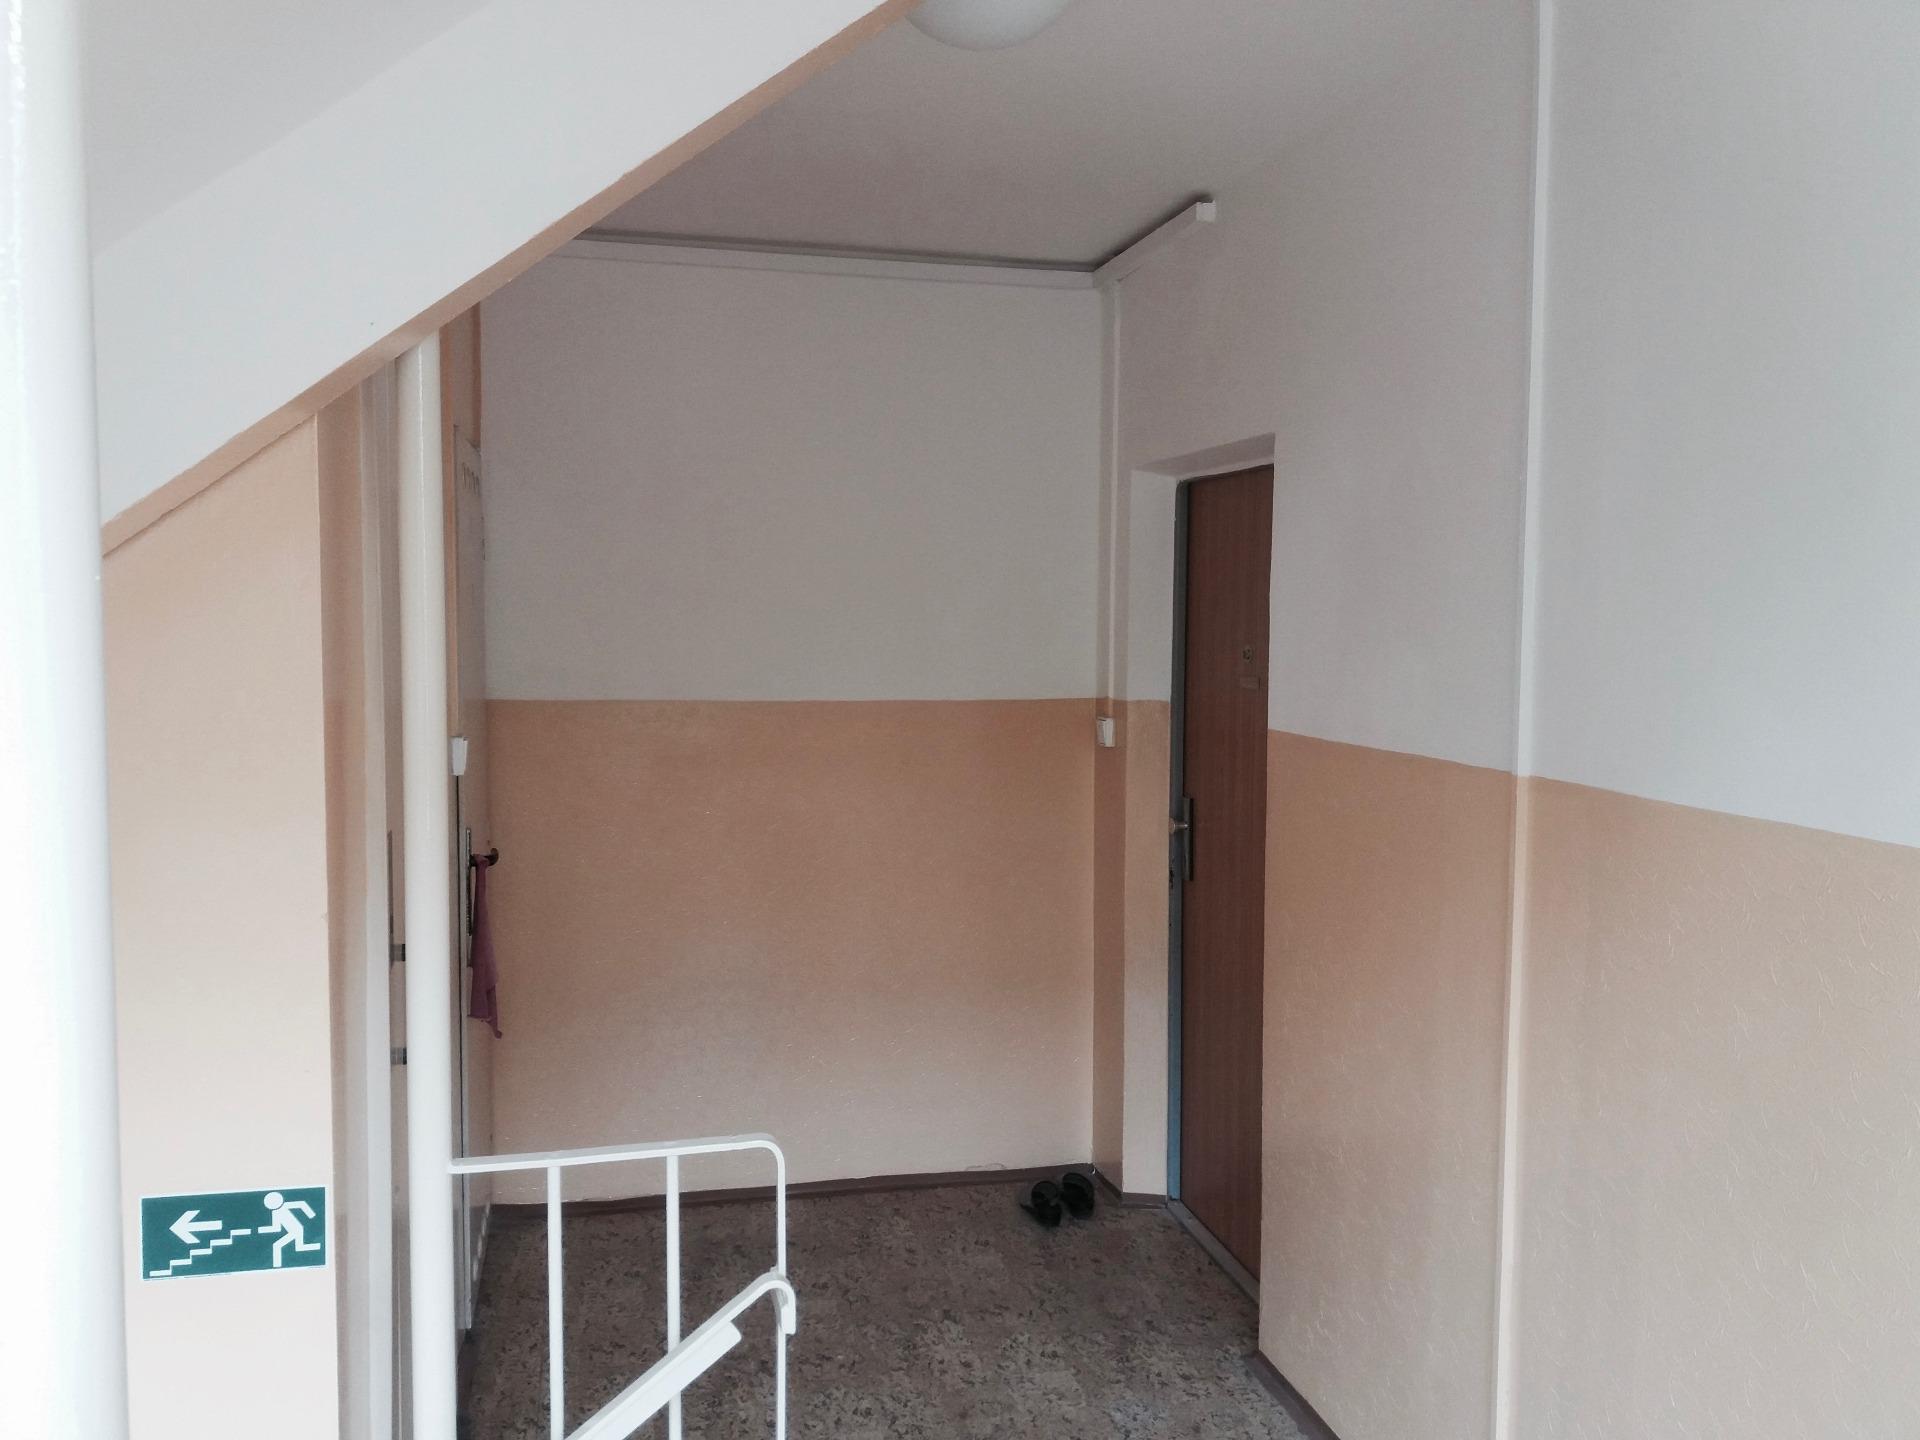 Malíři pokojů a bytů v Praze